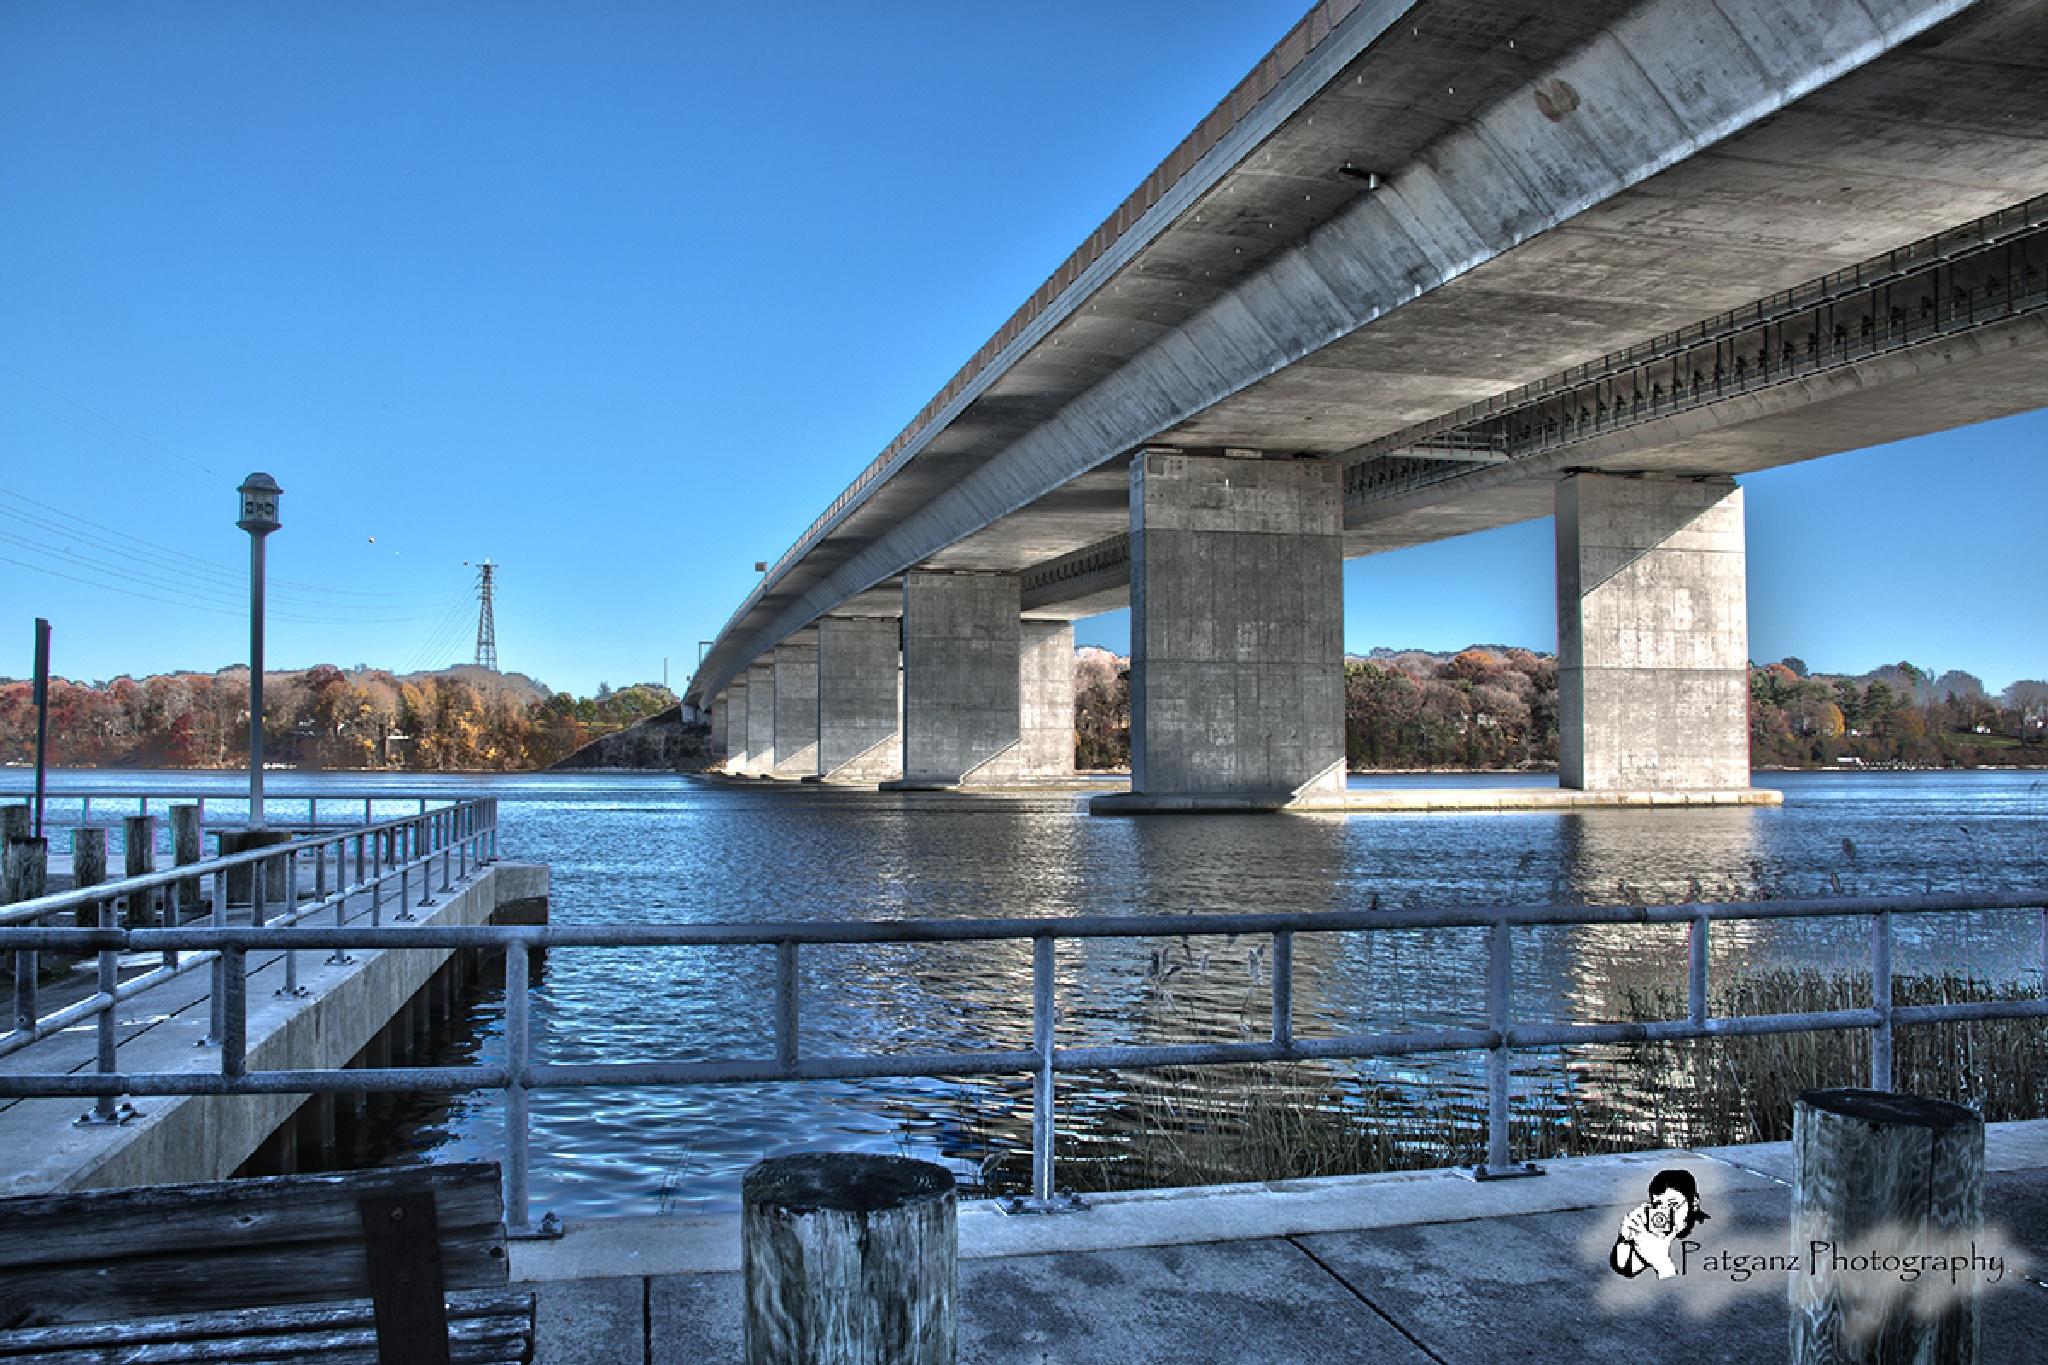 Bridging the Gap by Patrick J Gannon